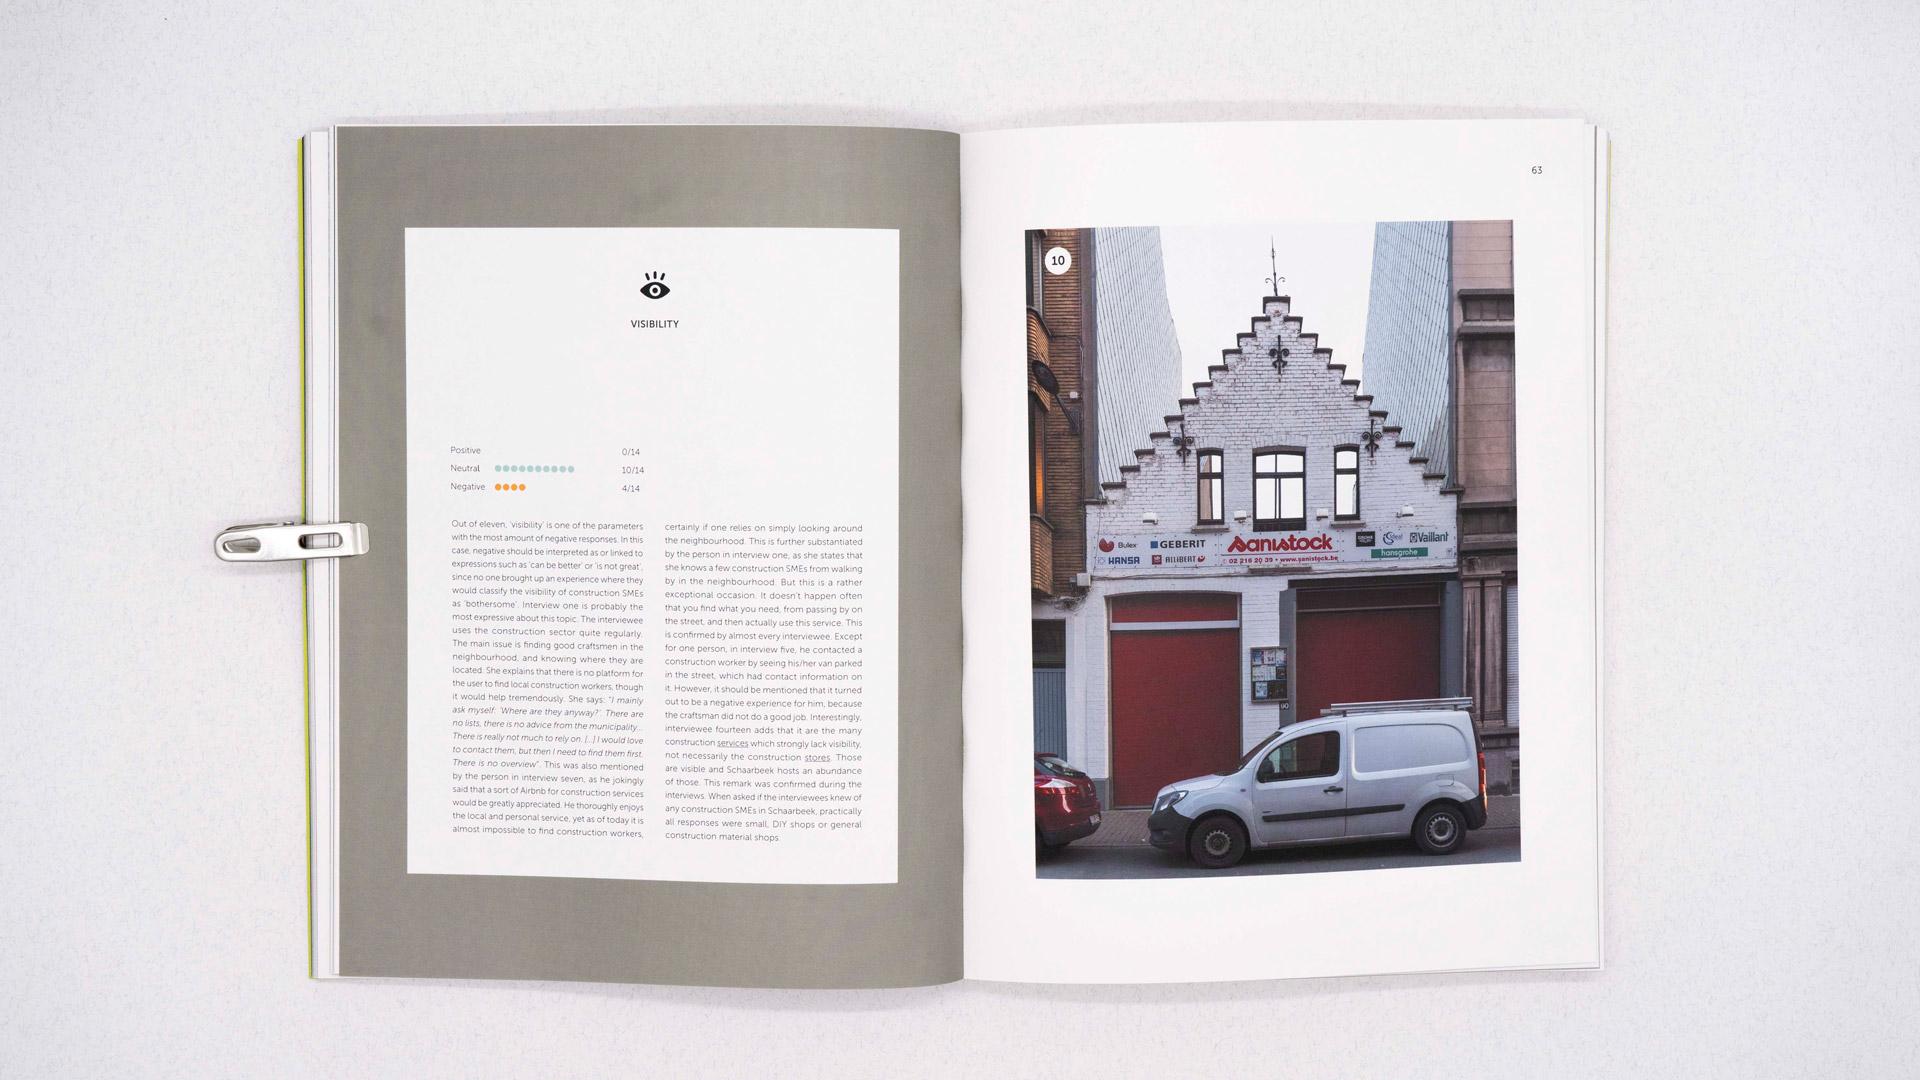 schaarbeek_speak_photo3_printed_book